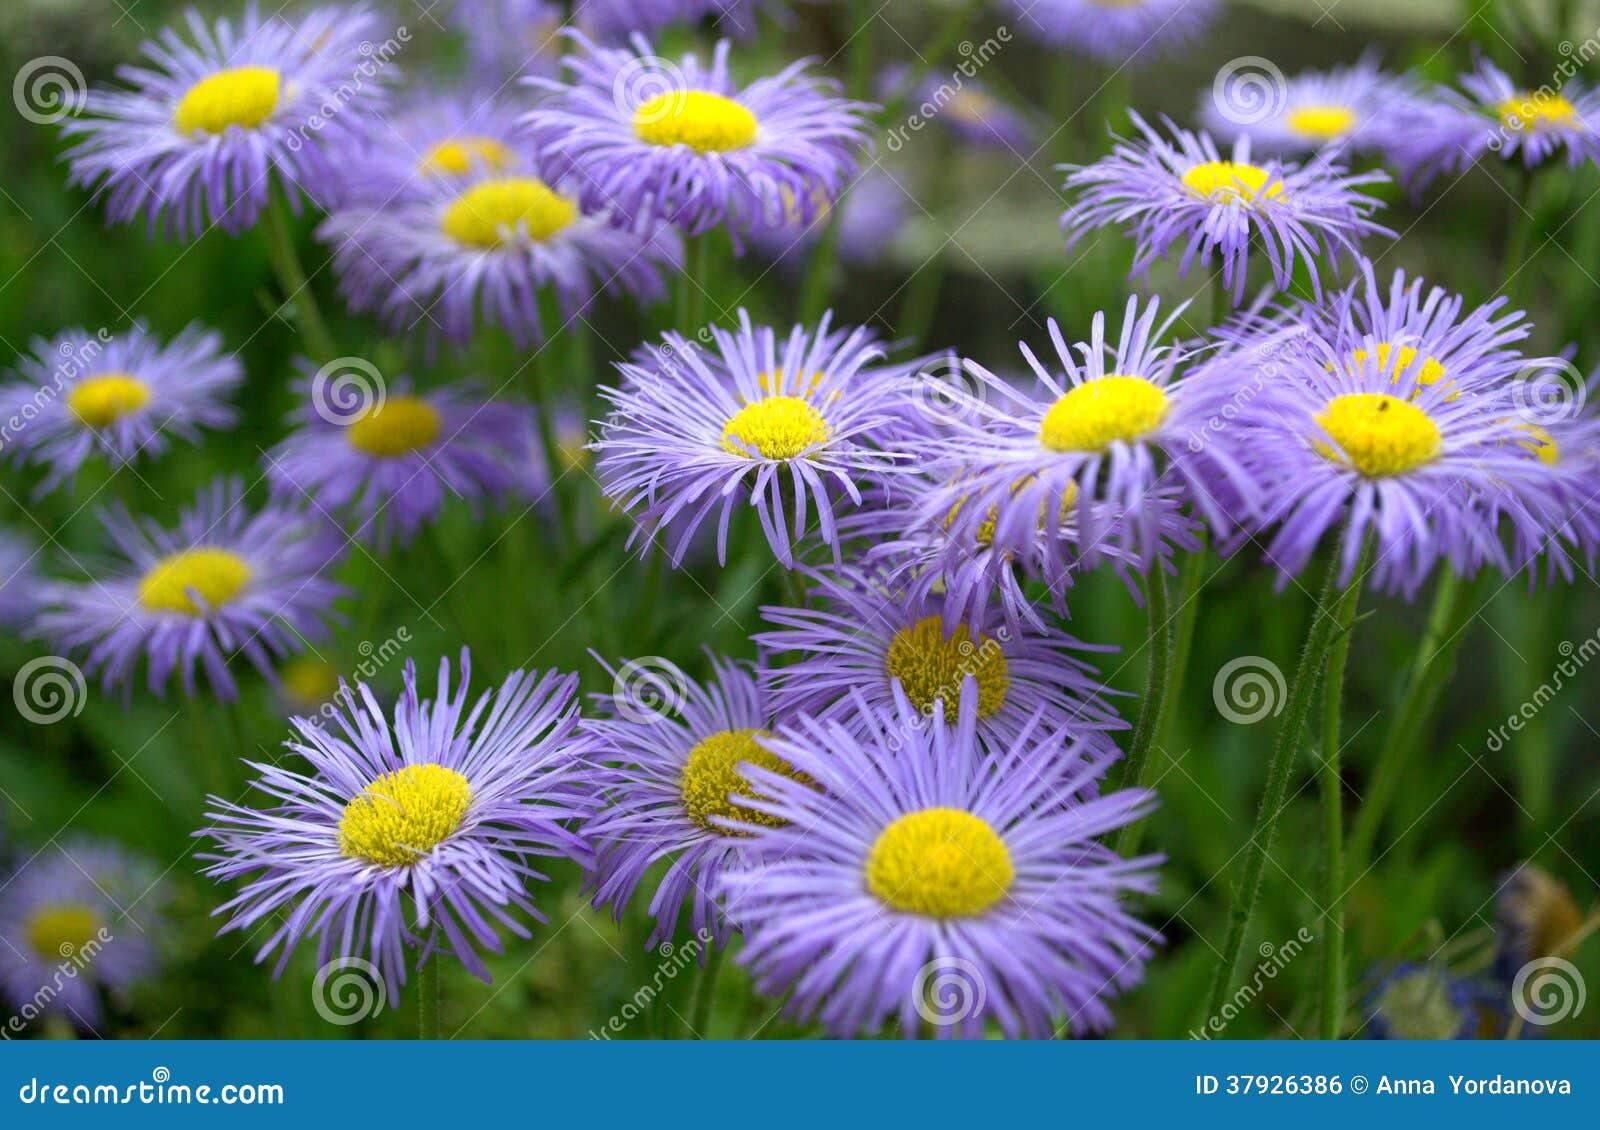 Erigeron Speciosus Flower Close Up Royalty Free Stock ...